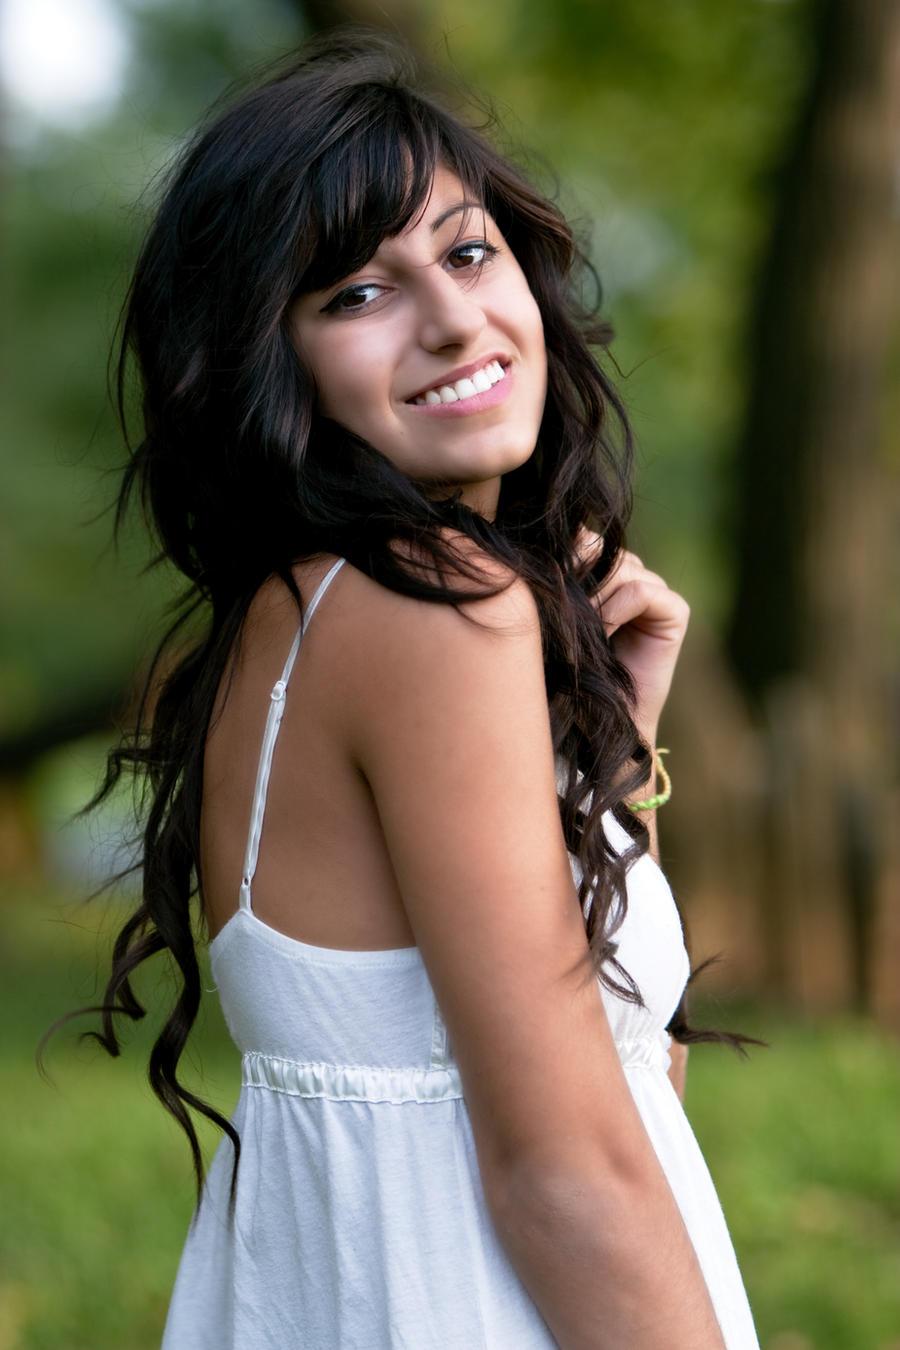 Pretty Young Girl By Bodhichita On Deviantart